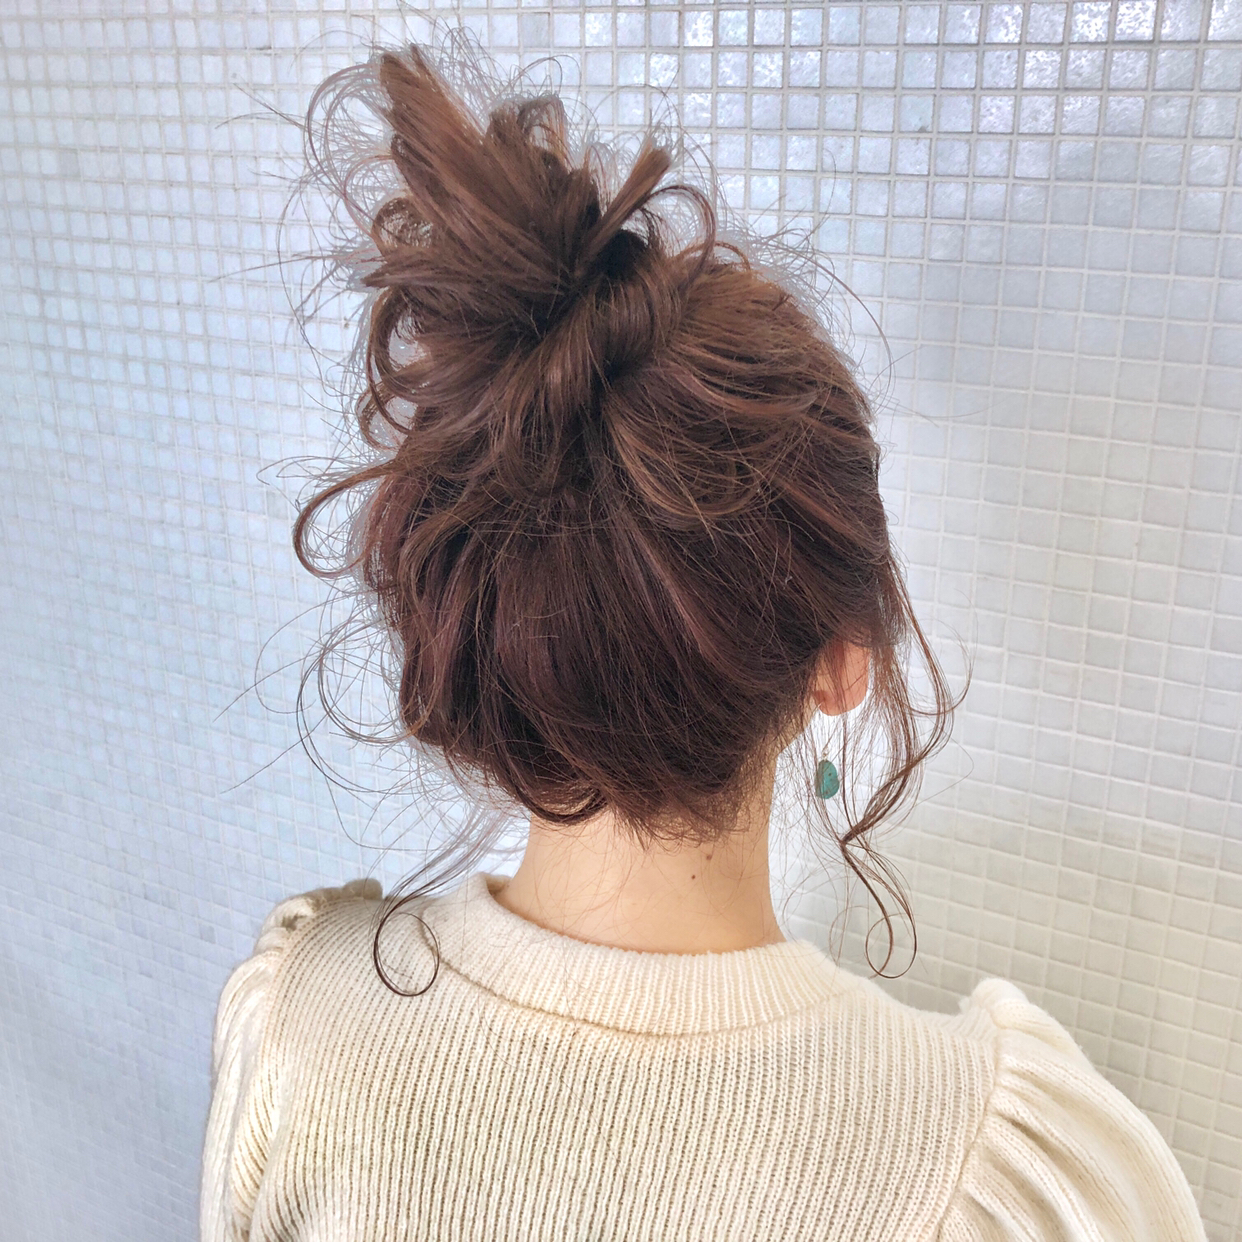 kawamura_takashi_cam  毛先を折り曲げて作るお団子ヘア ヘアアレンジ&ヘアセット  河村タカシ  #hairarrangecam  #hairarrange  #hairset  #hair  #ヘアアレンジ  #へアセット  #ヘア  #関西  #大阪  #心斎橋  #hairdresser  #美容師  #サロンモデル募集  #サロモ  #おくれ毛  #簡単ヘアアレンジ  #お団子ヘア